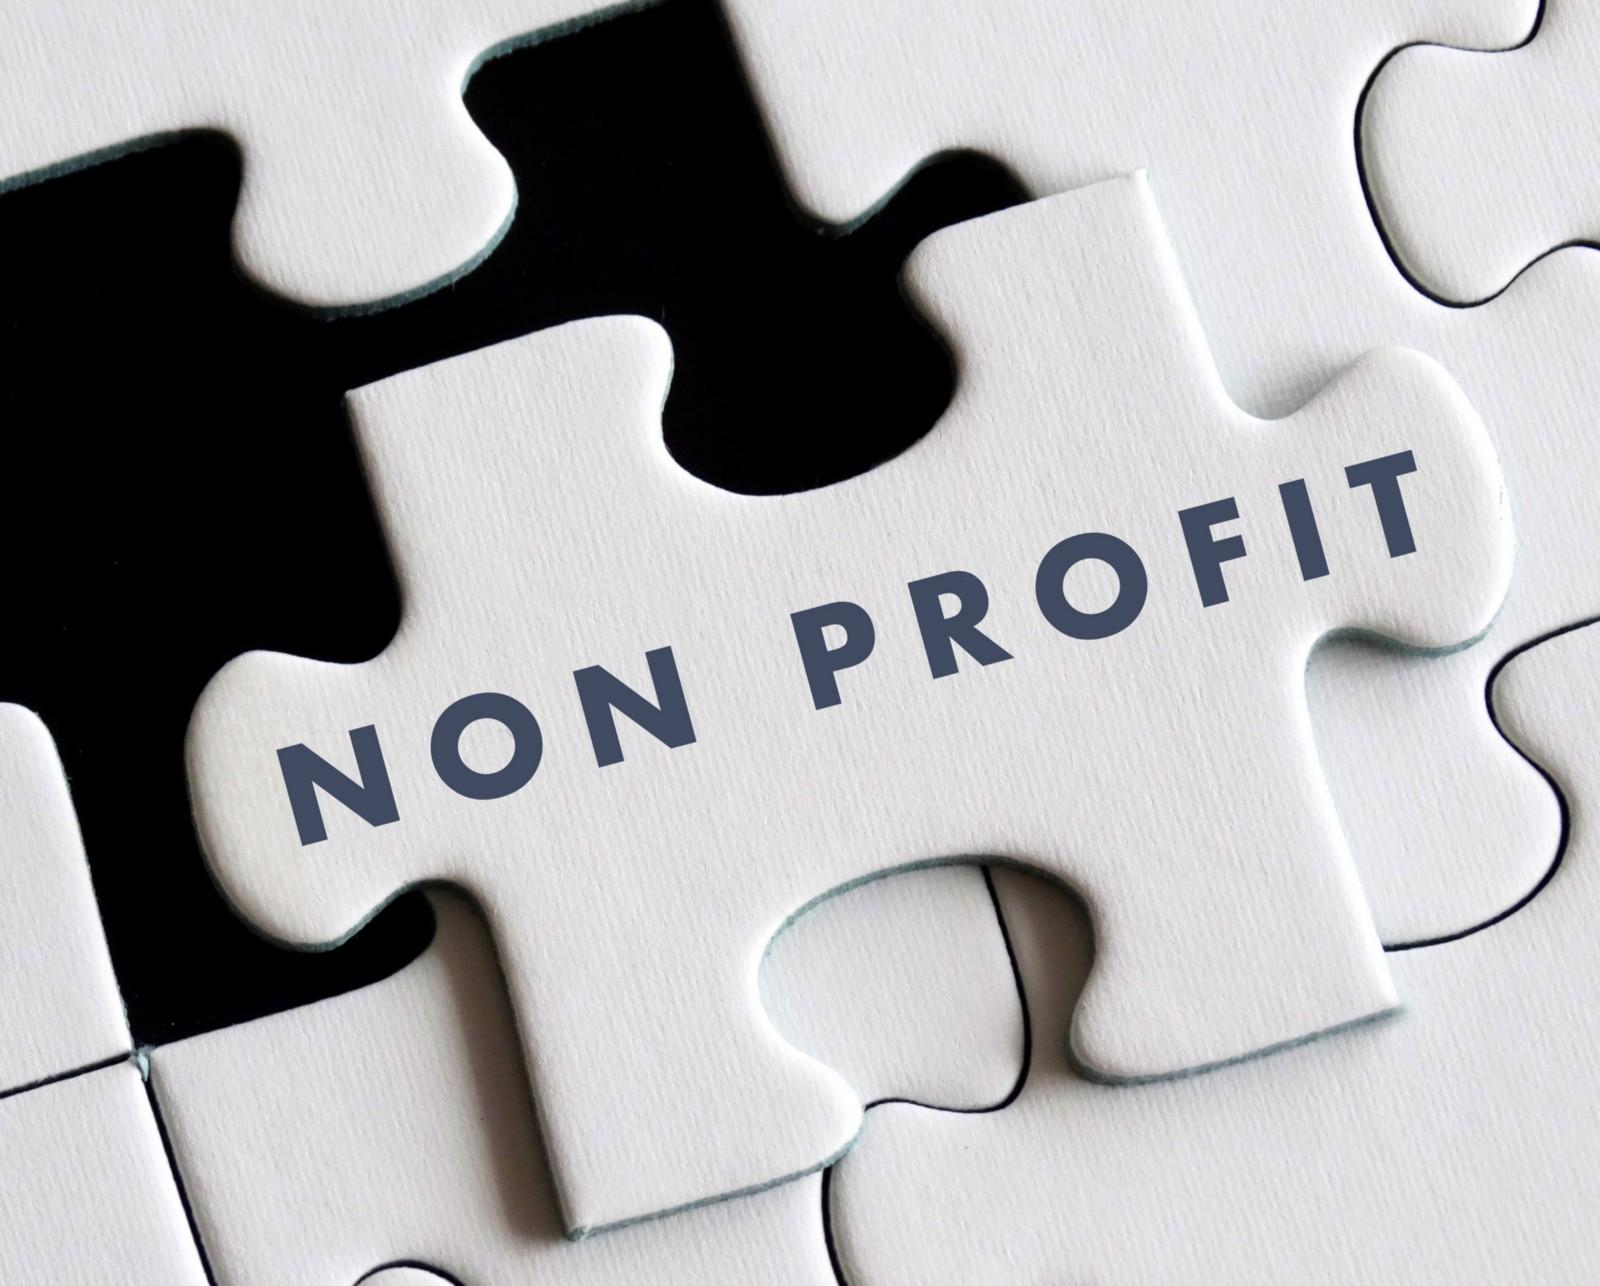 Can we increase financial inclusion through nonprofit-powered fintech?